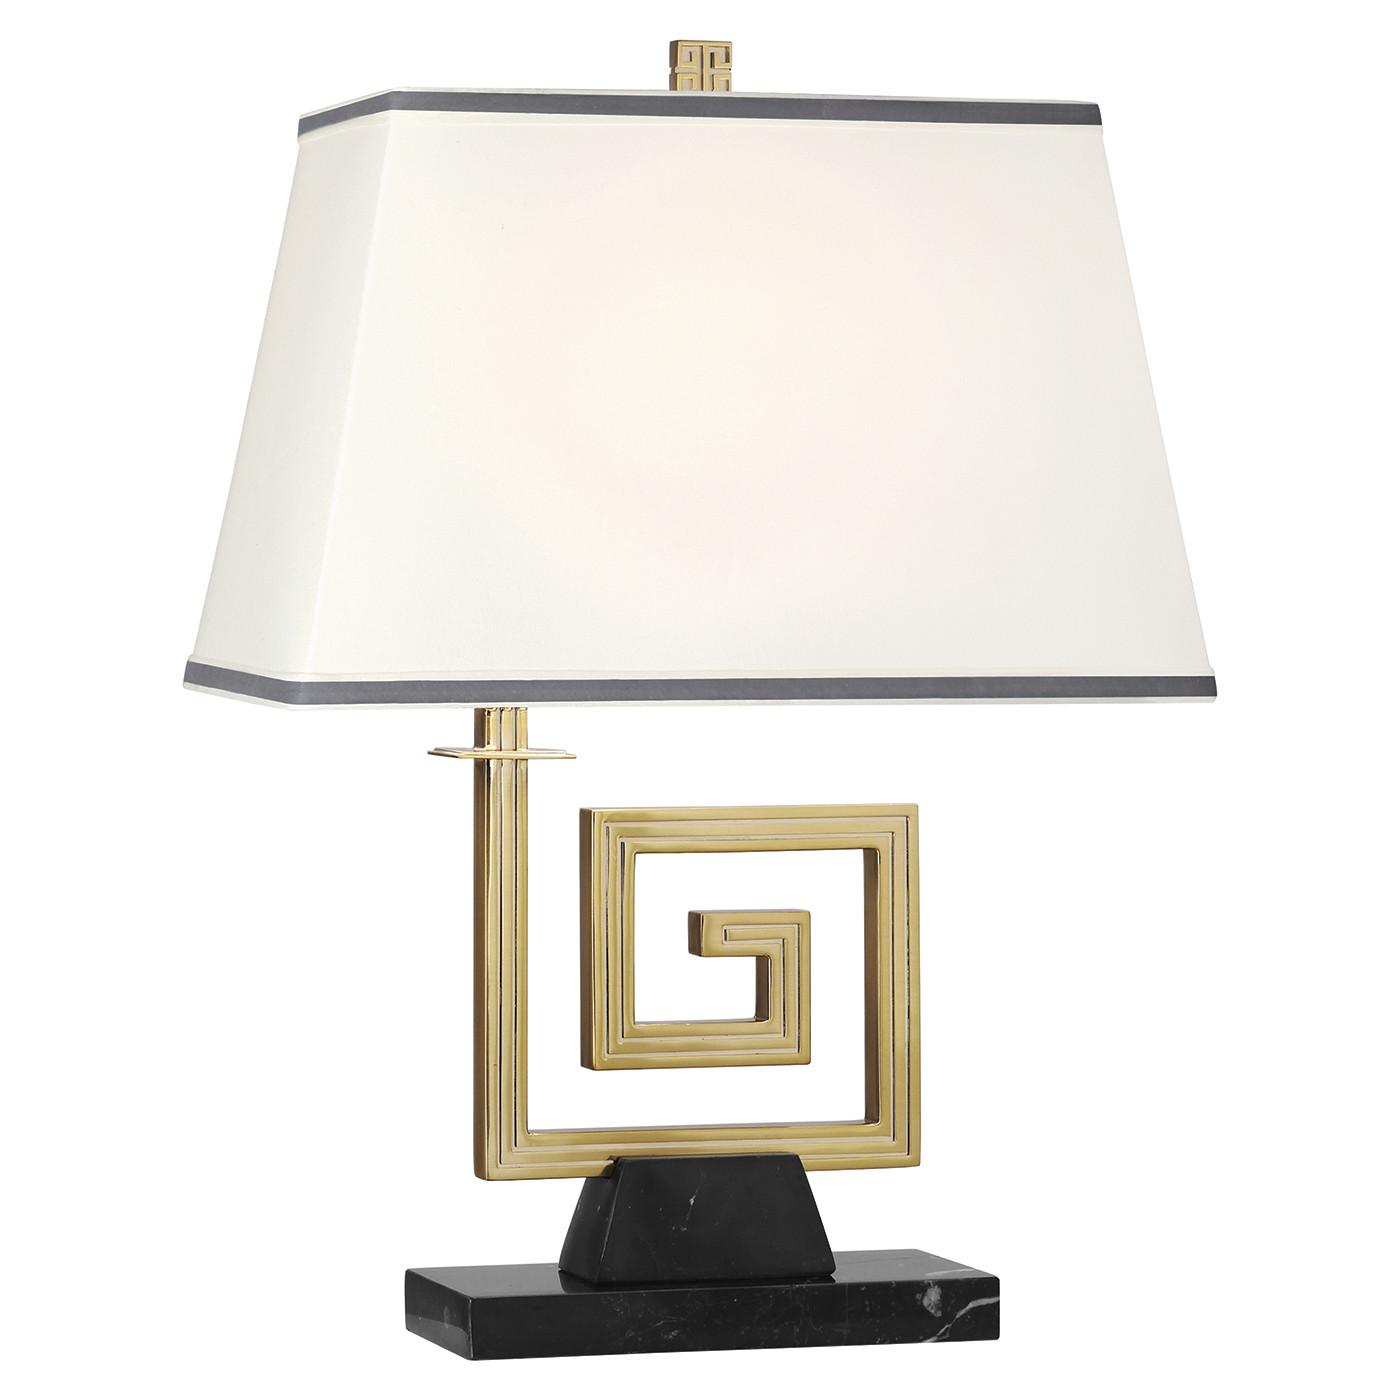 Mykonos Brass  or Nickel Table Lamp